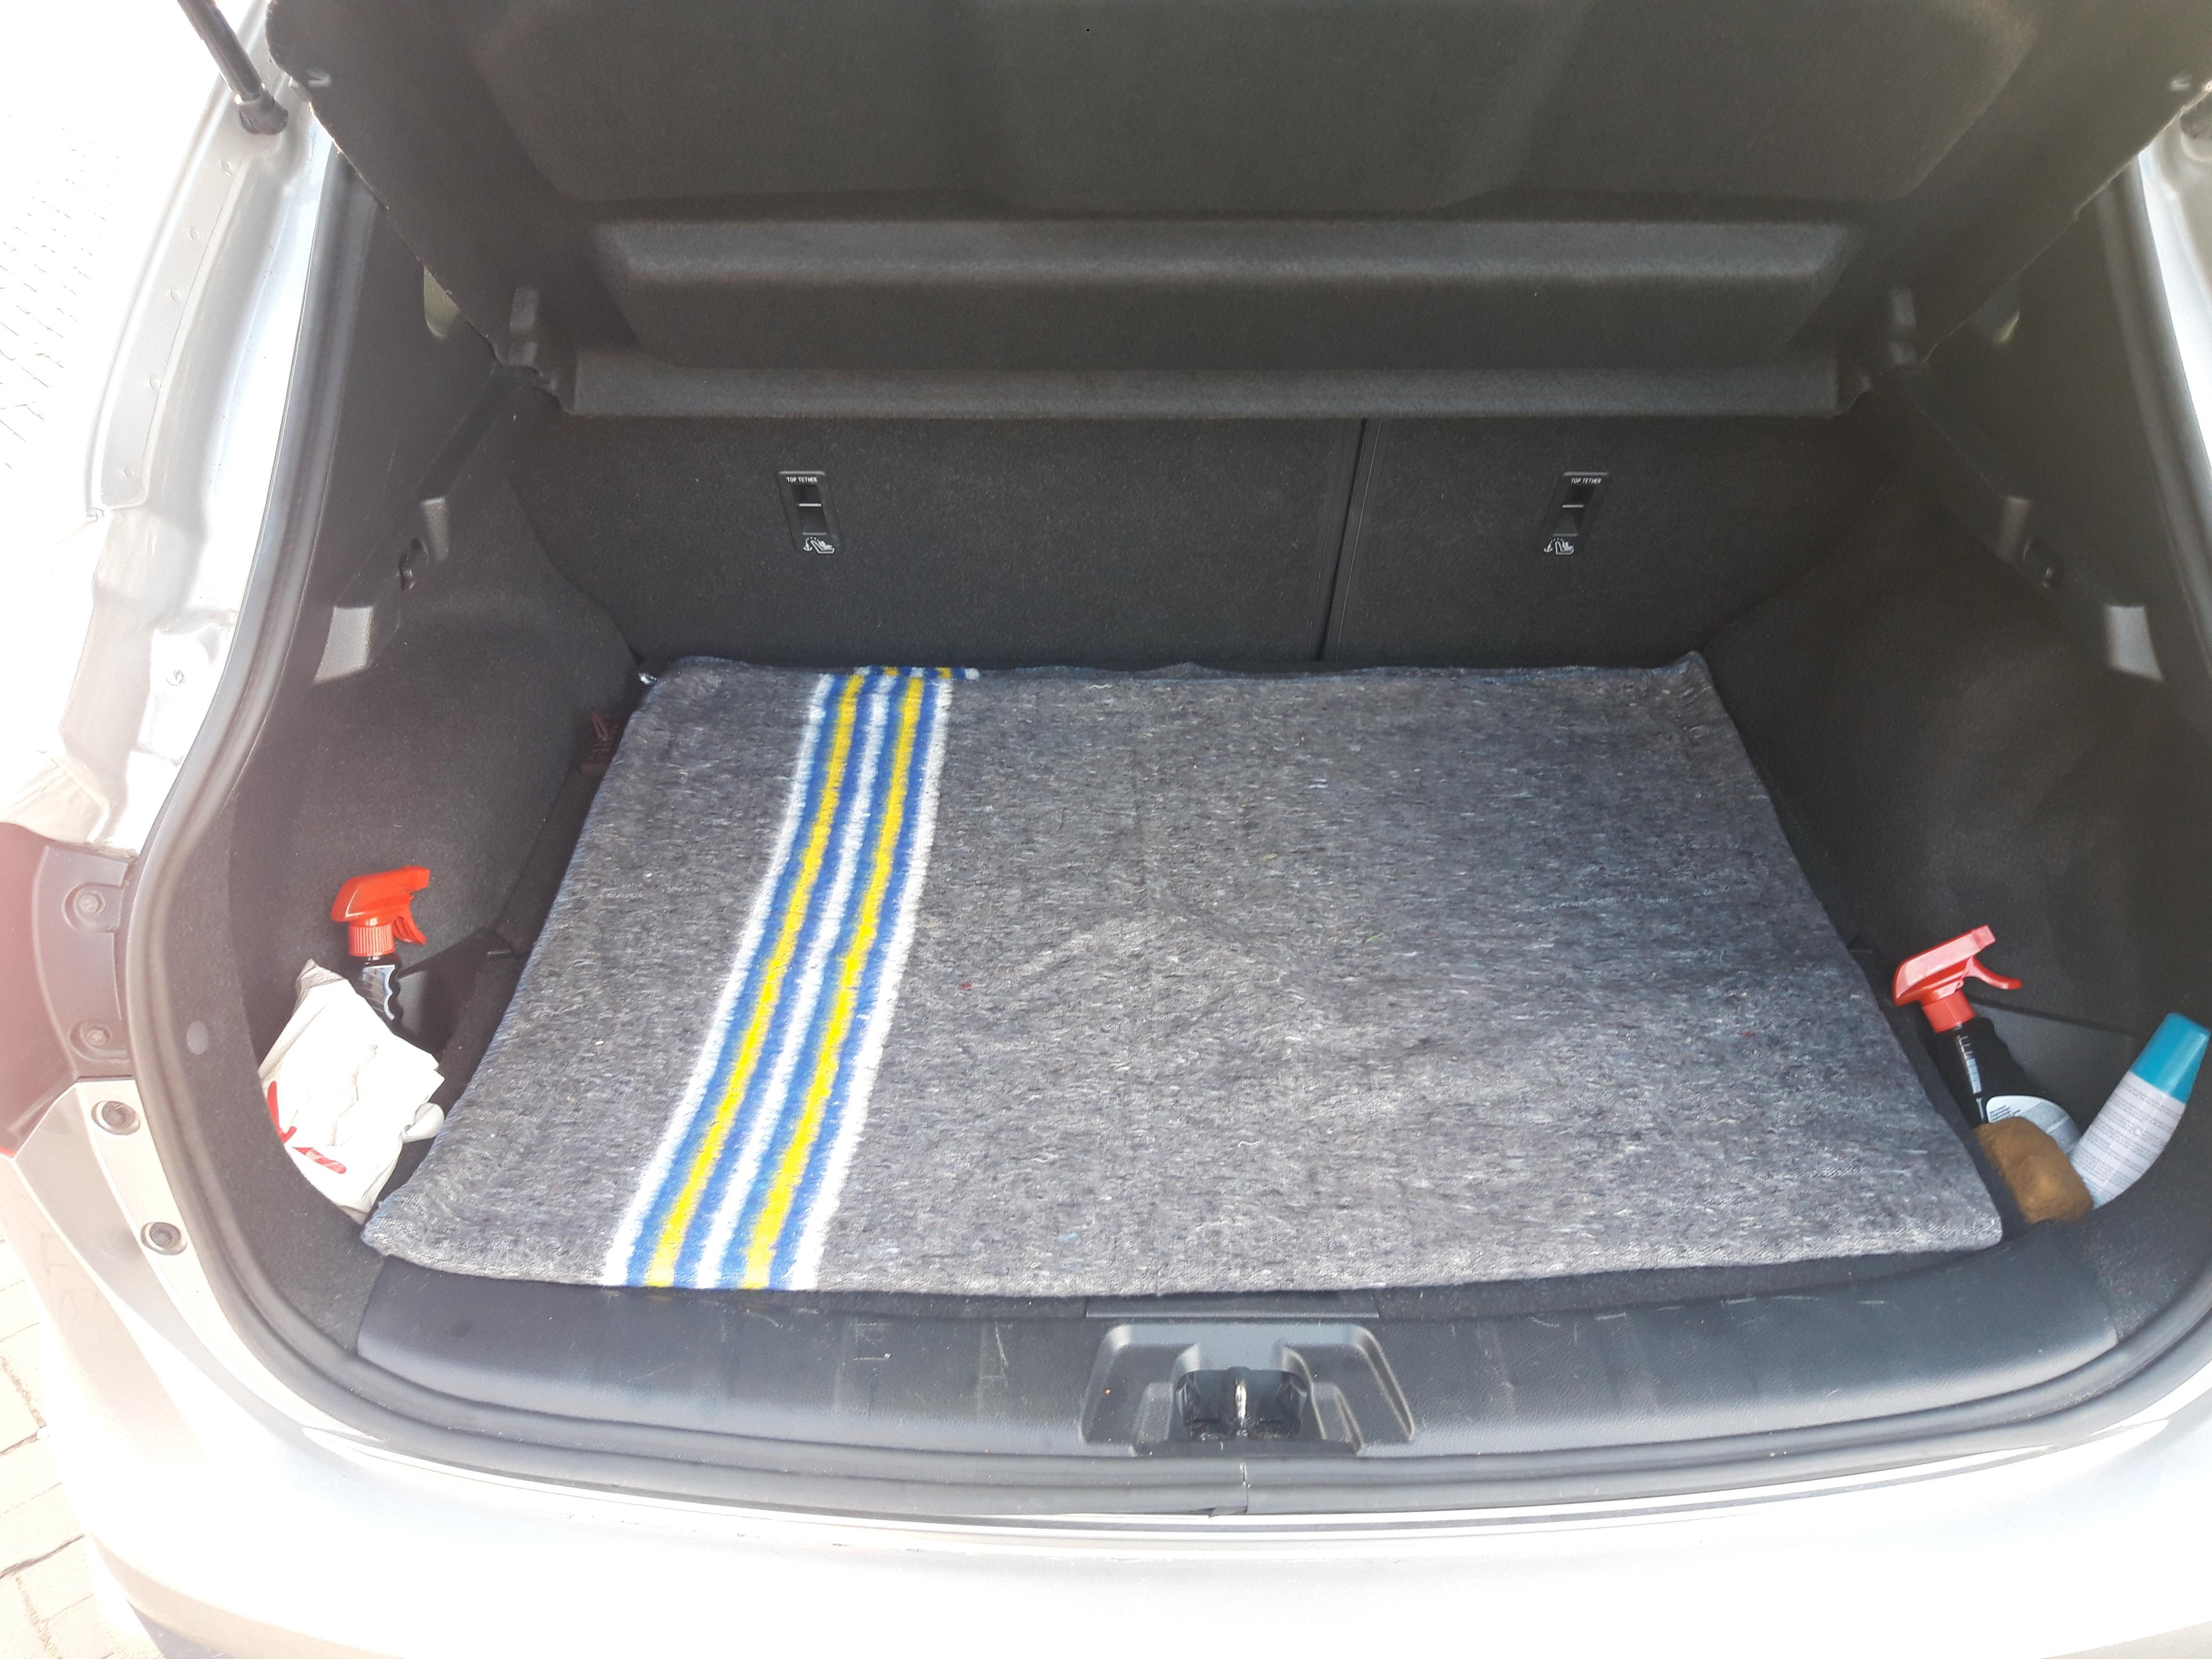 Verhuisdekens (150 x 200 cm) gebruik: Bescherming bodem kofferbak